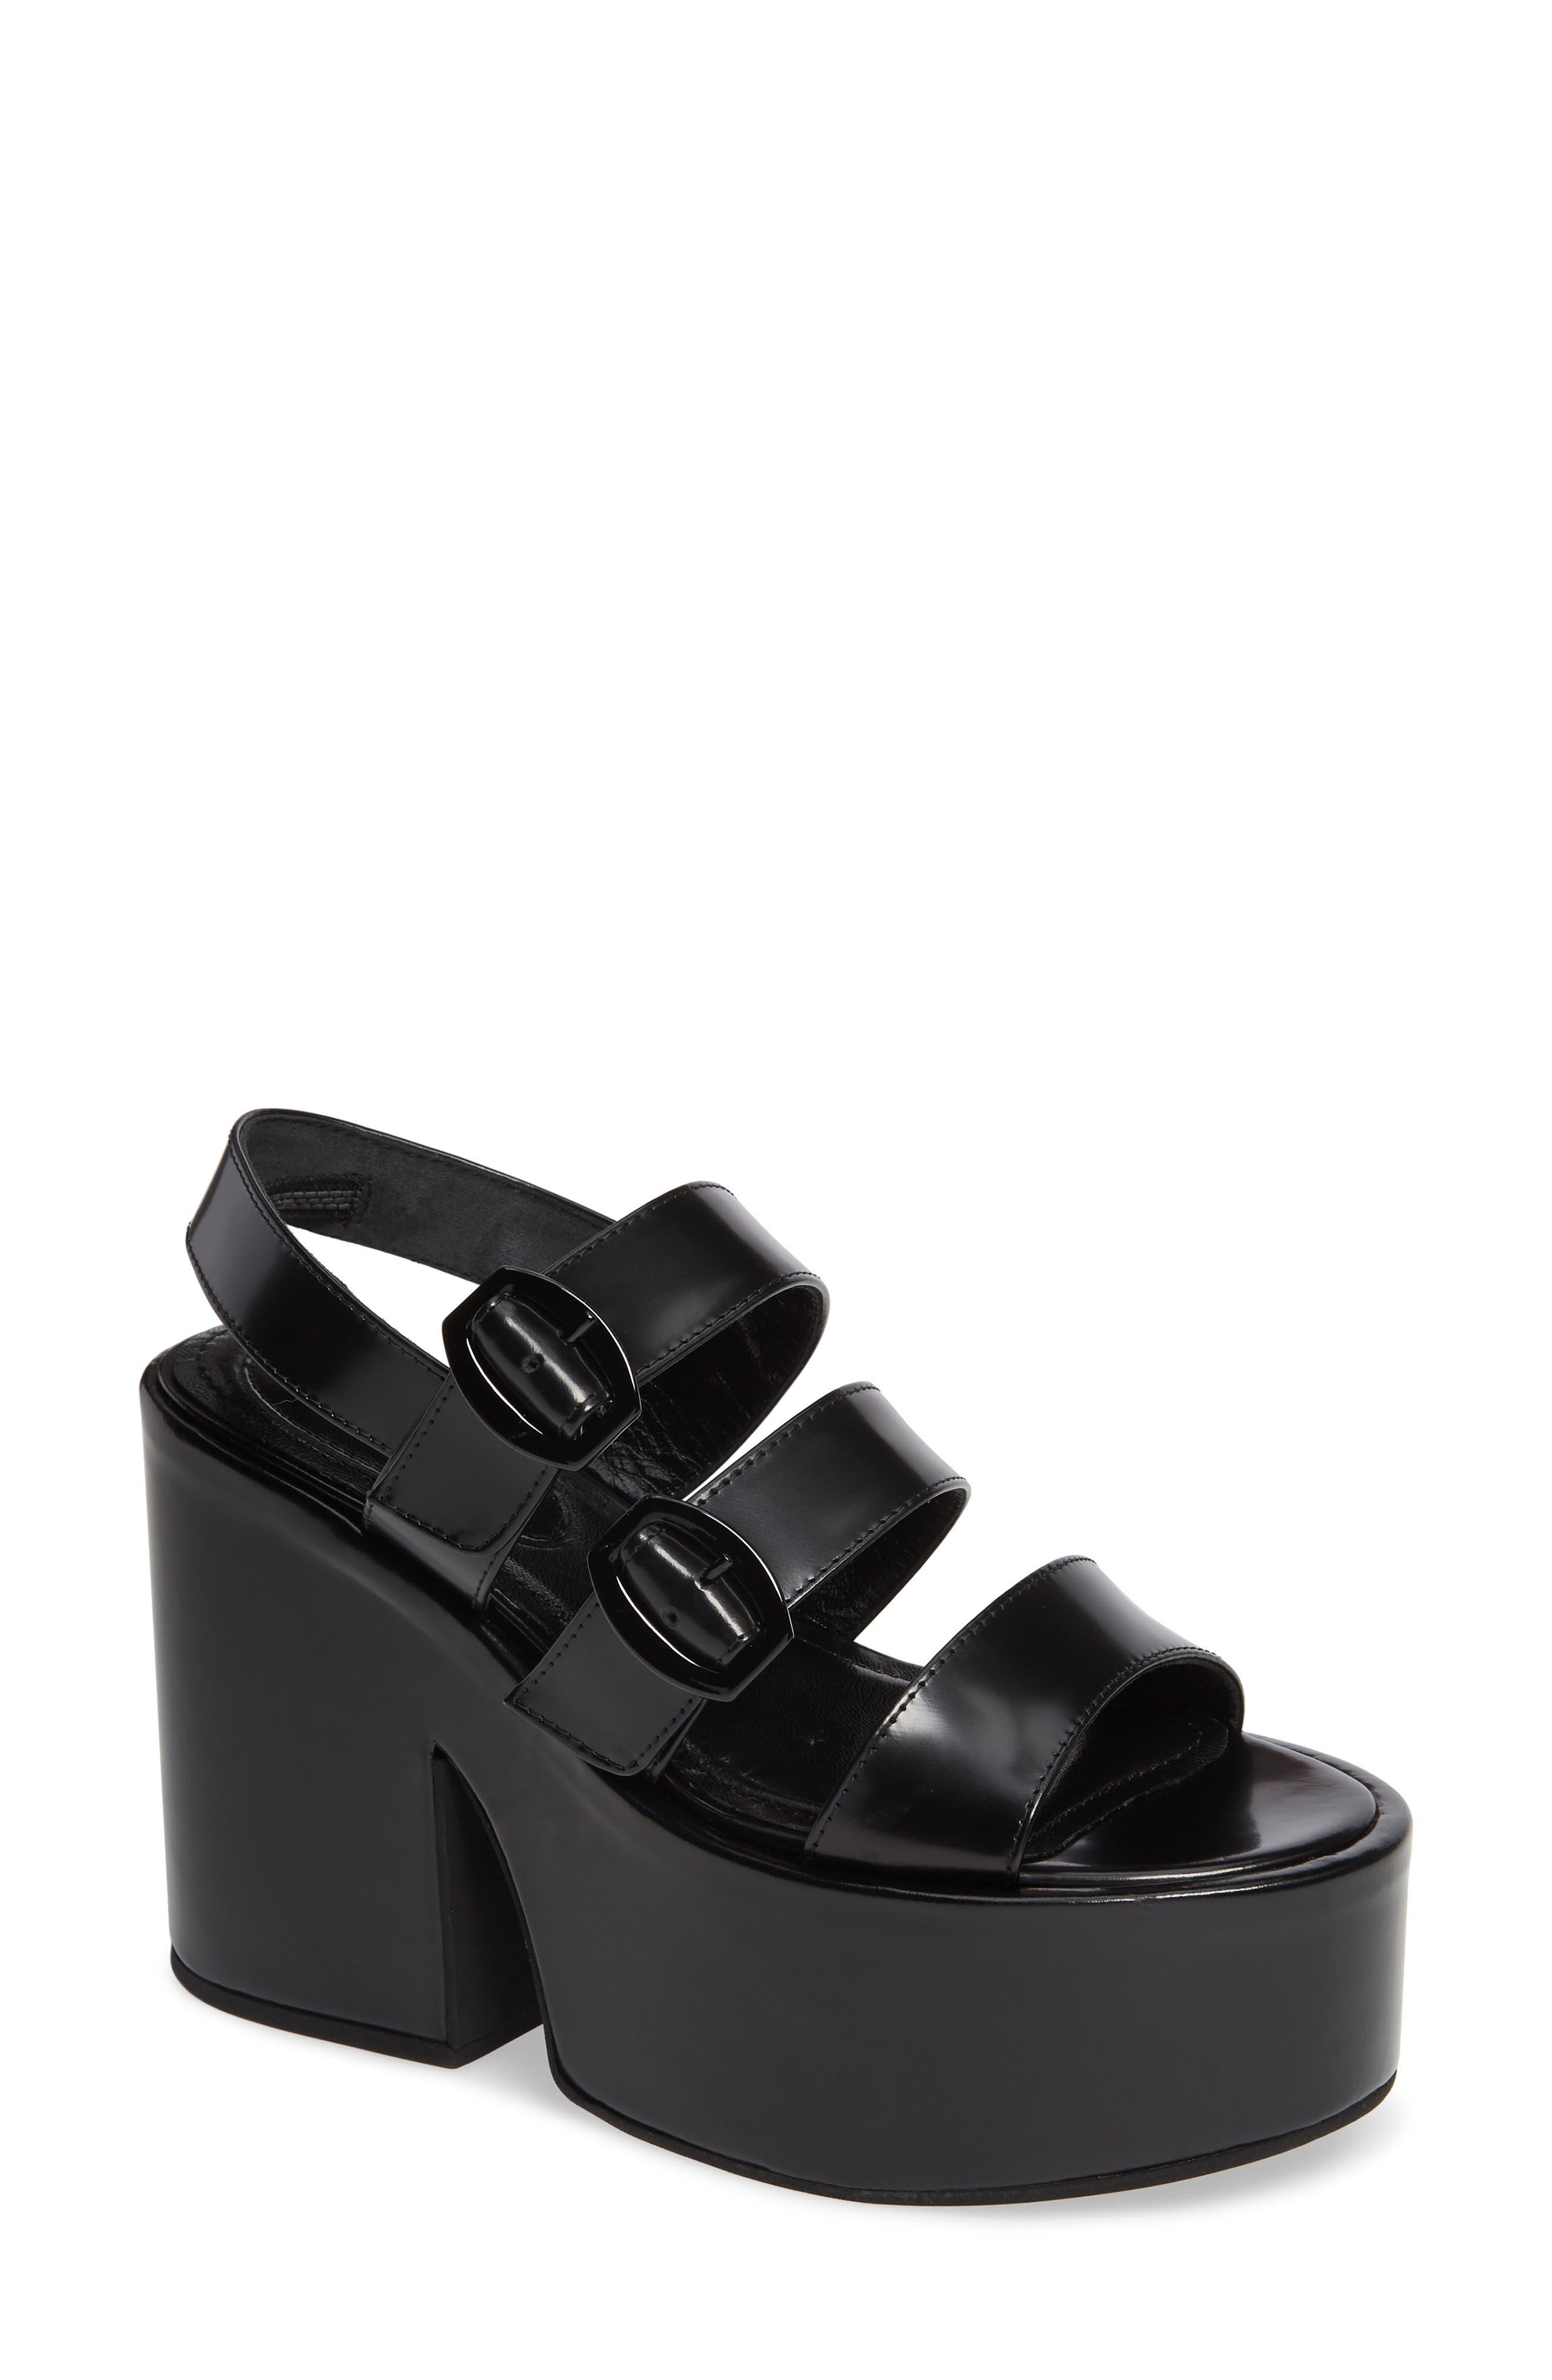 SIMONE ROCHA Strappy Platform Sandal, Main, color, 001